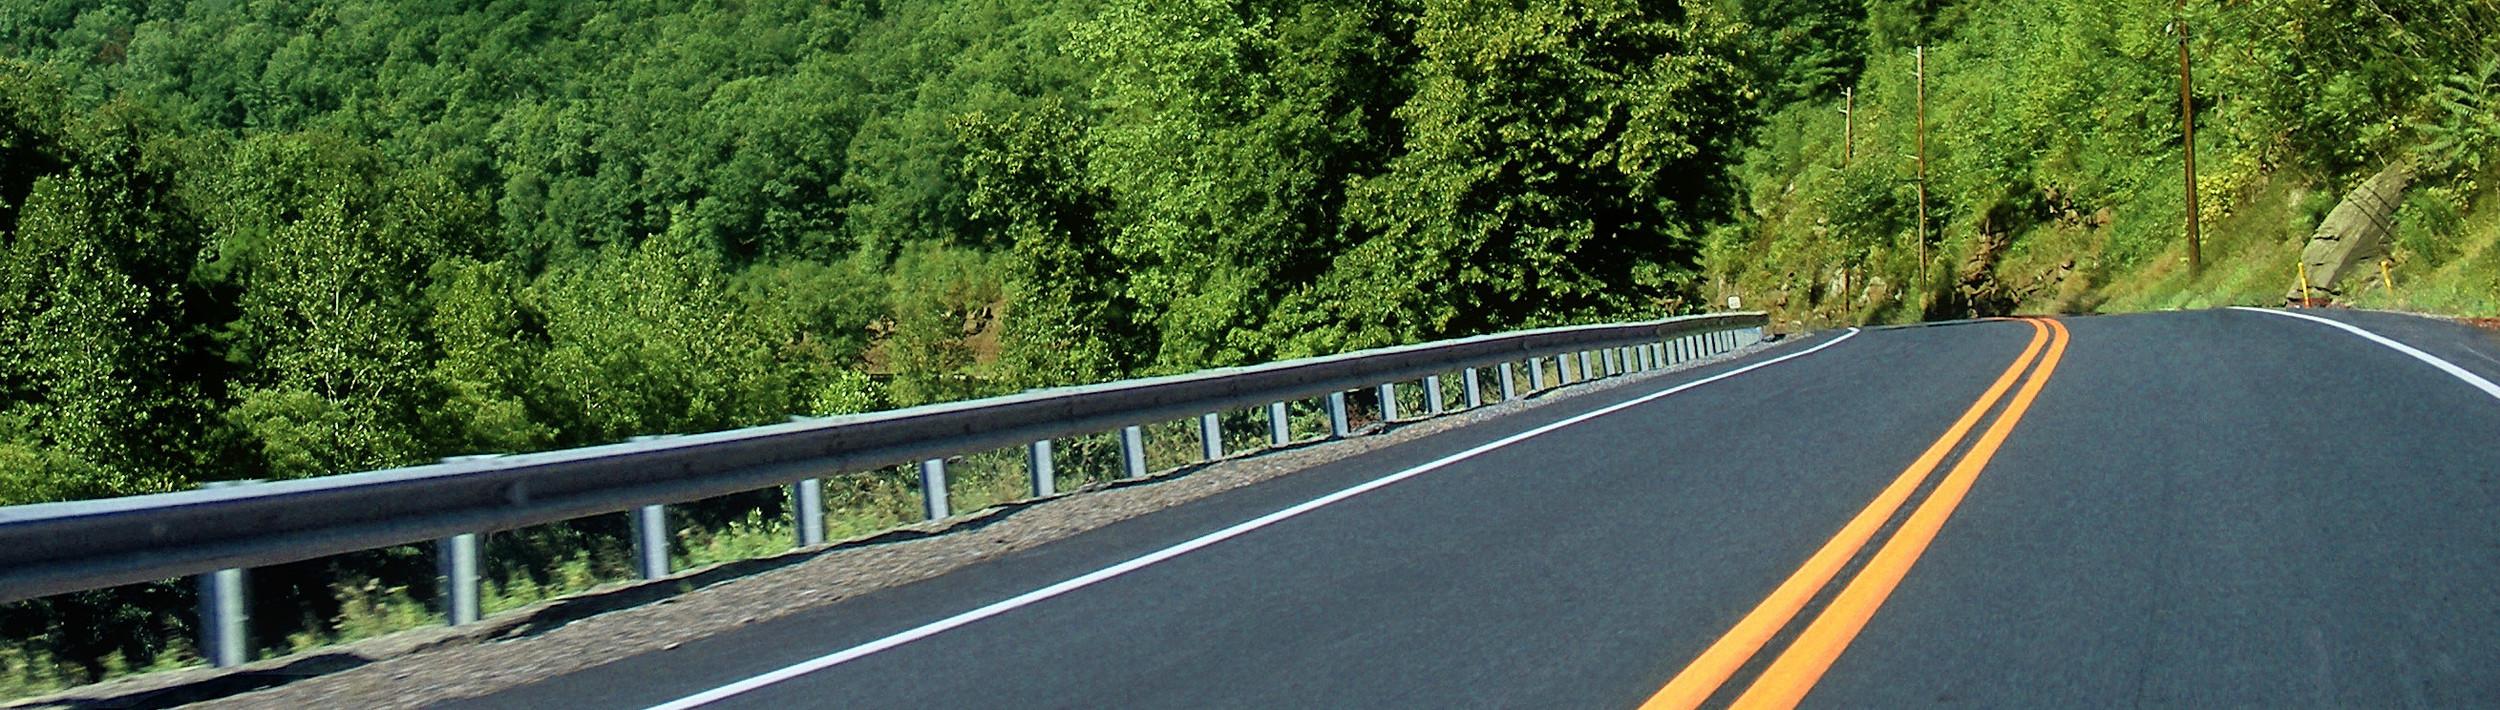 Flickr_-_Nicholas_T_-_Open_Road